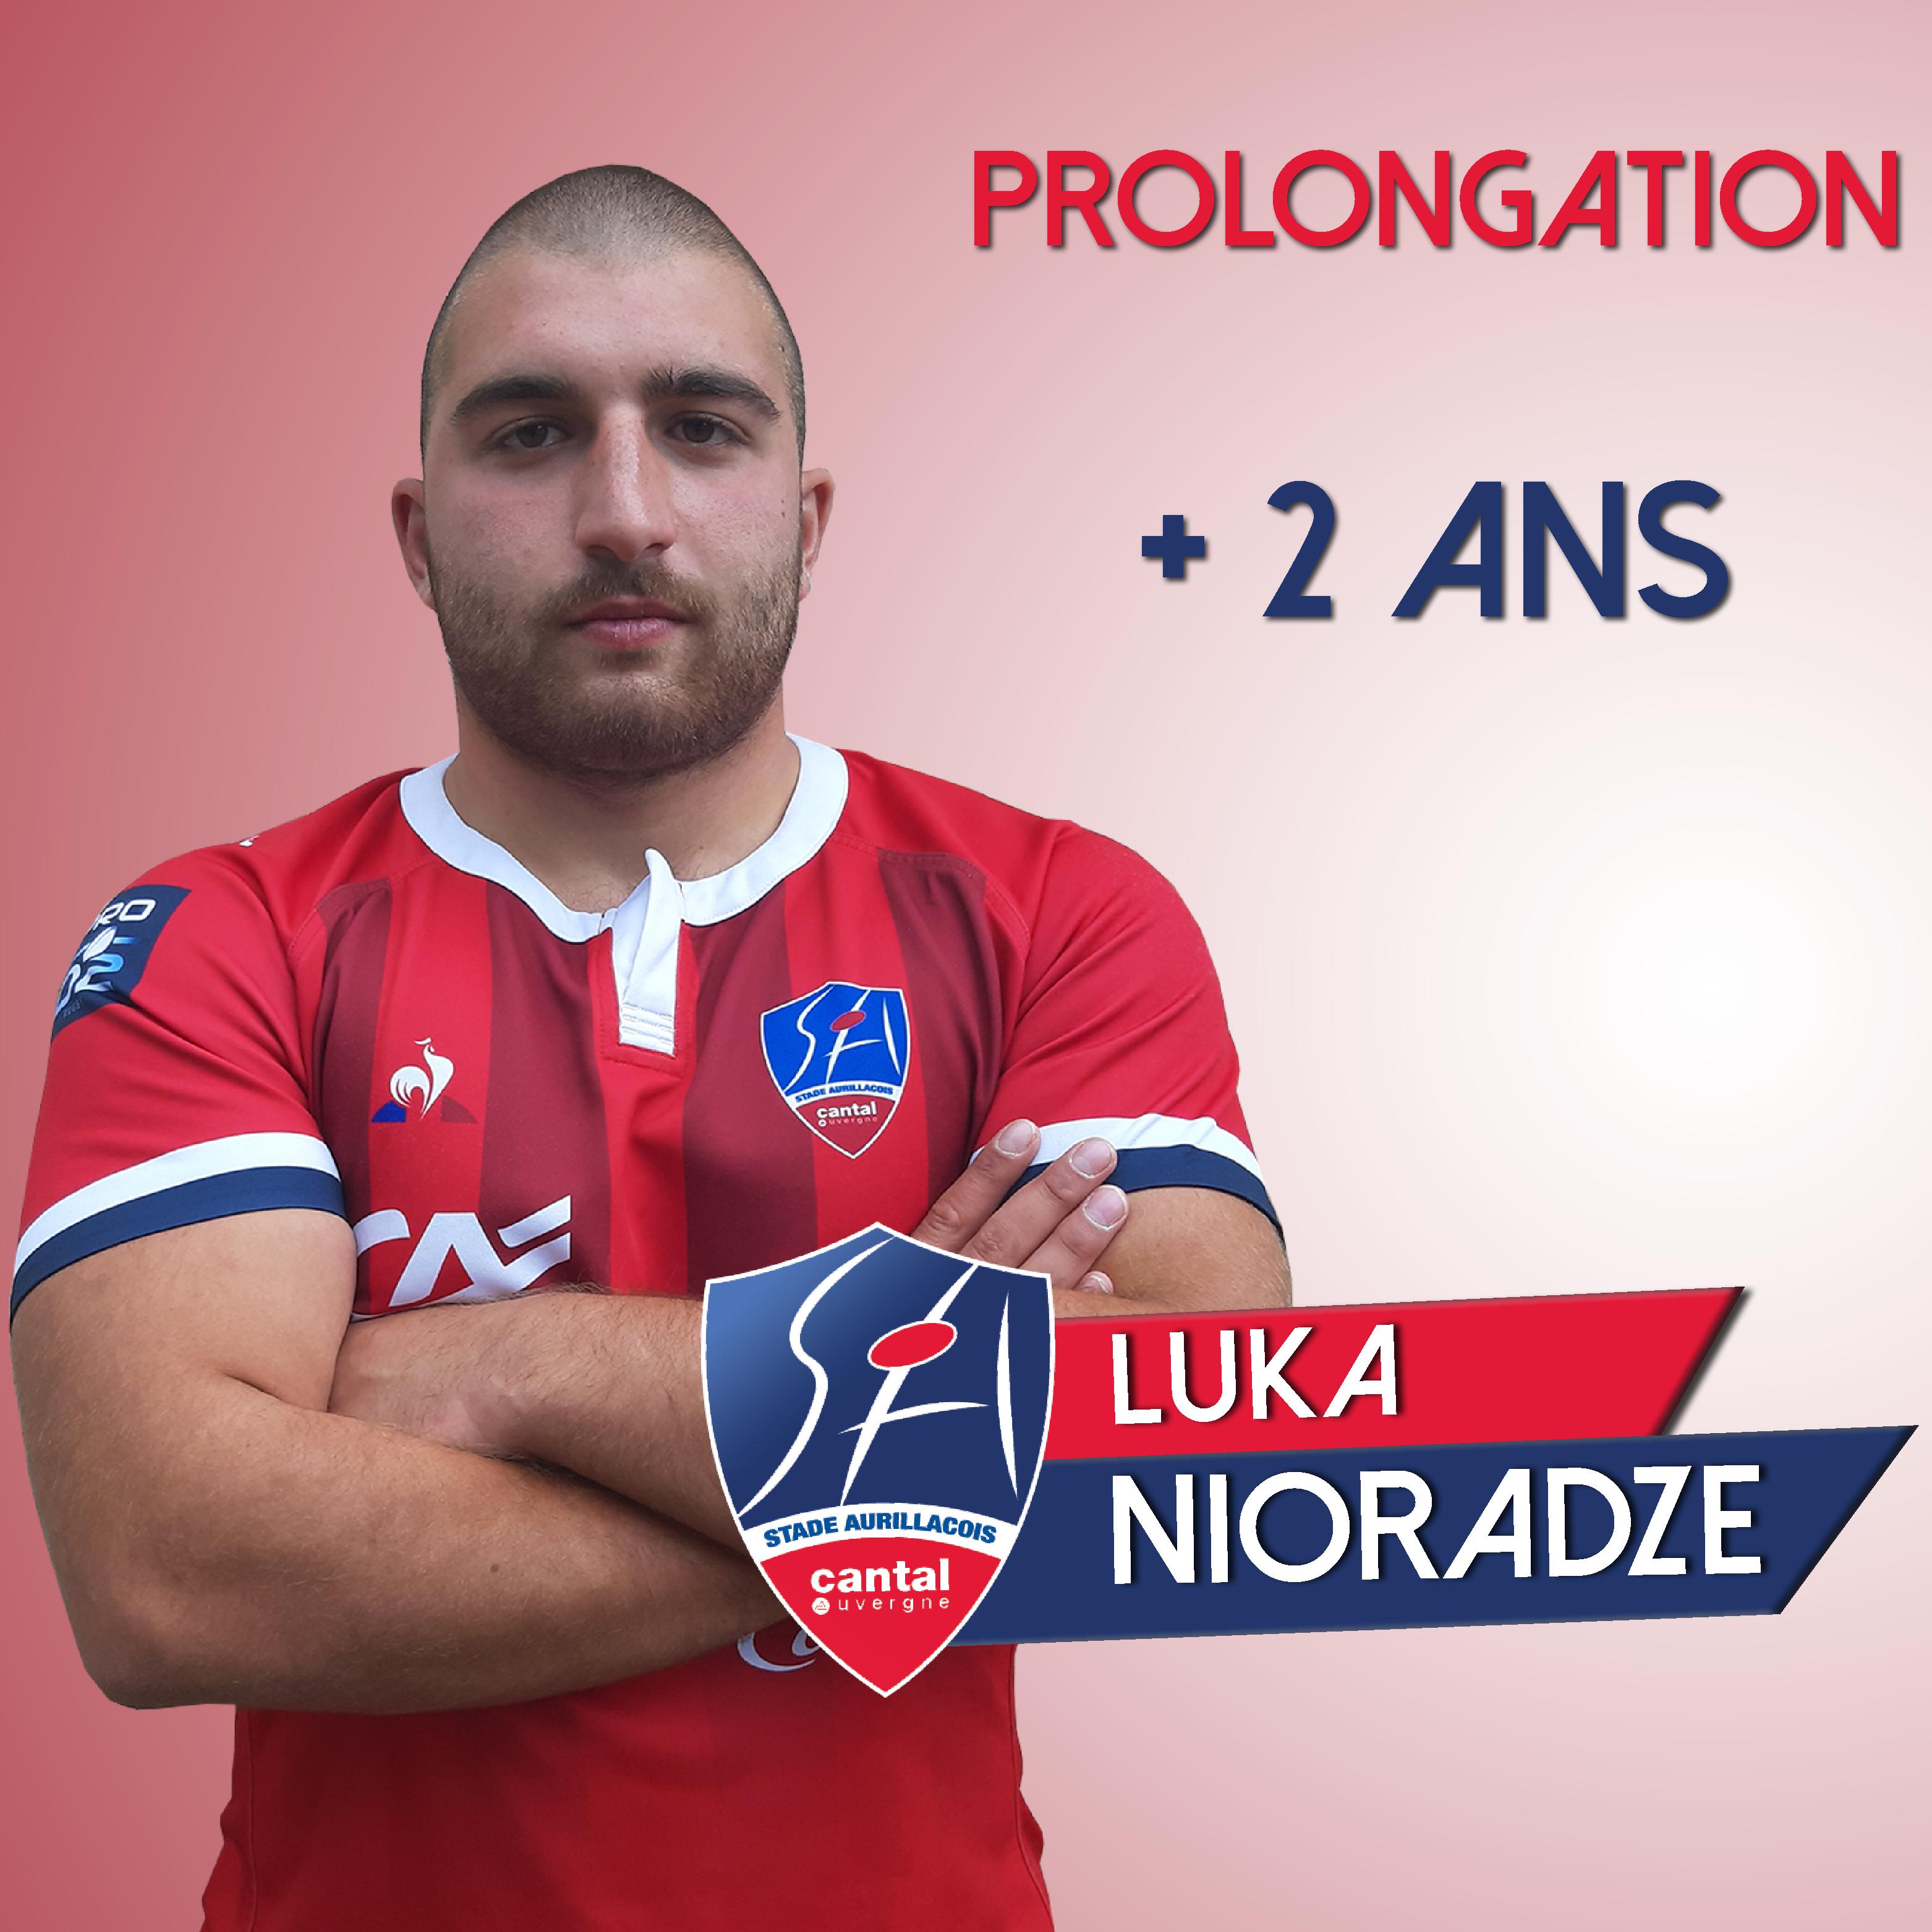 Prolongation de Luka Nioradze – Stade Aurillacois Cantal Auvergne